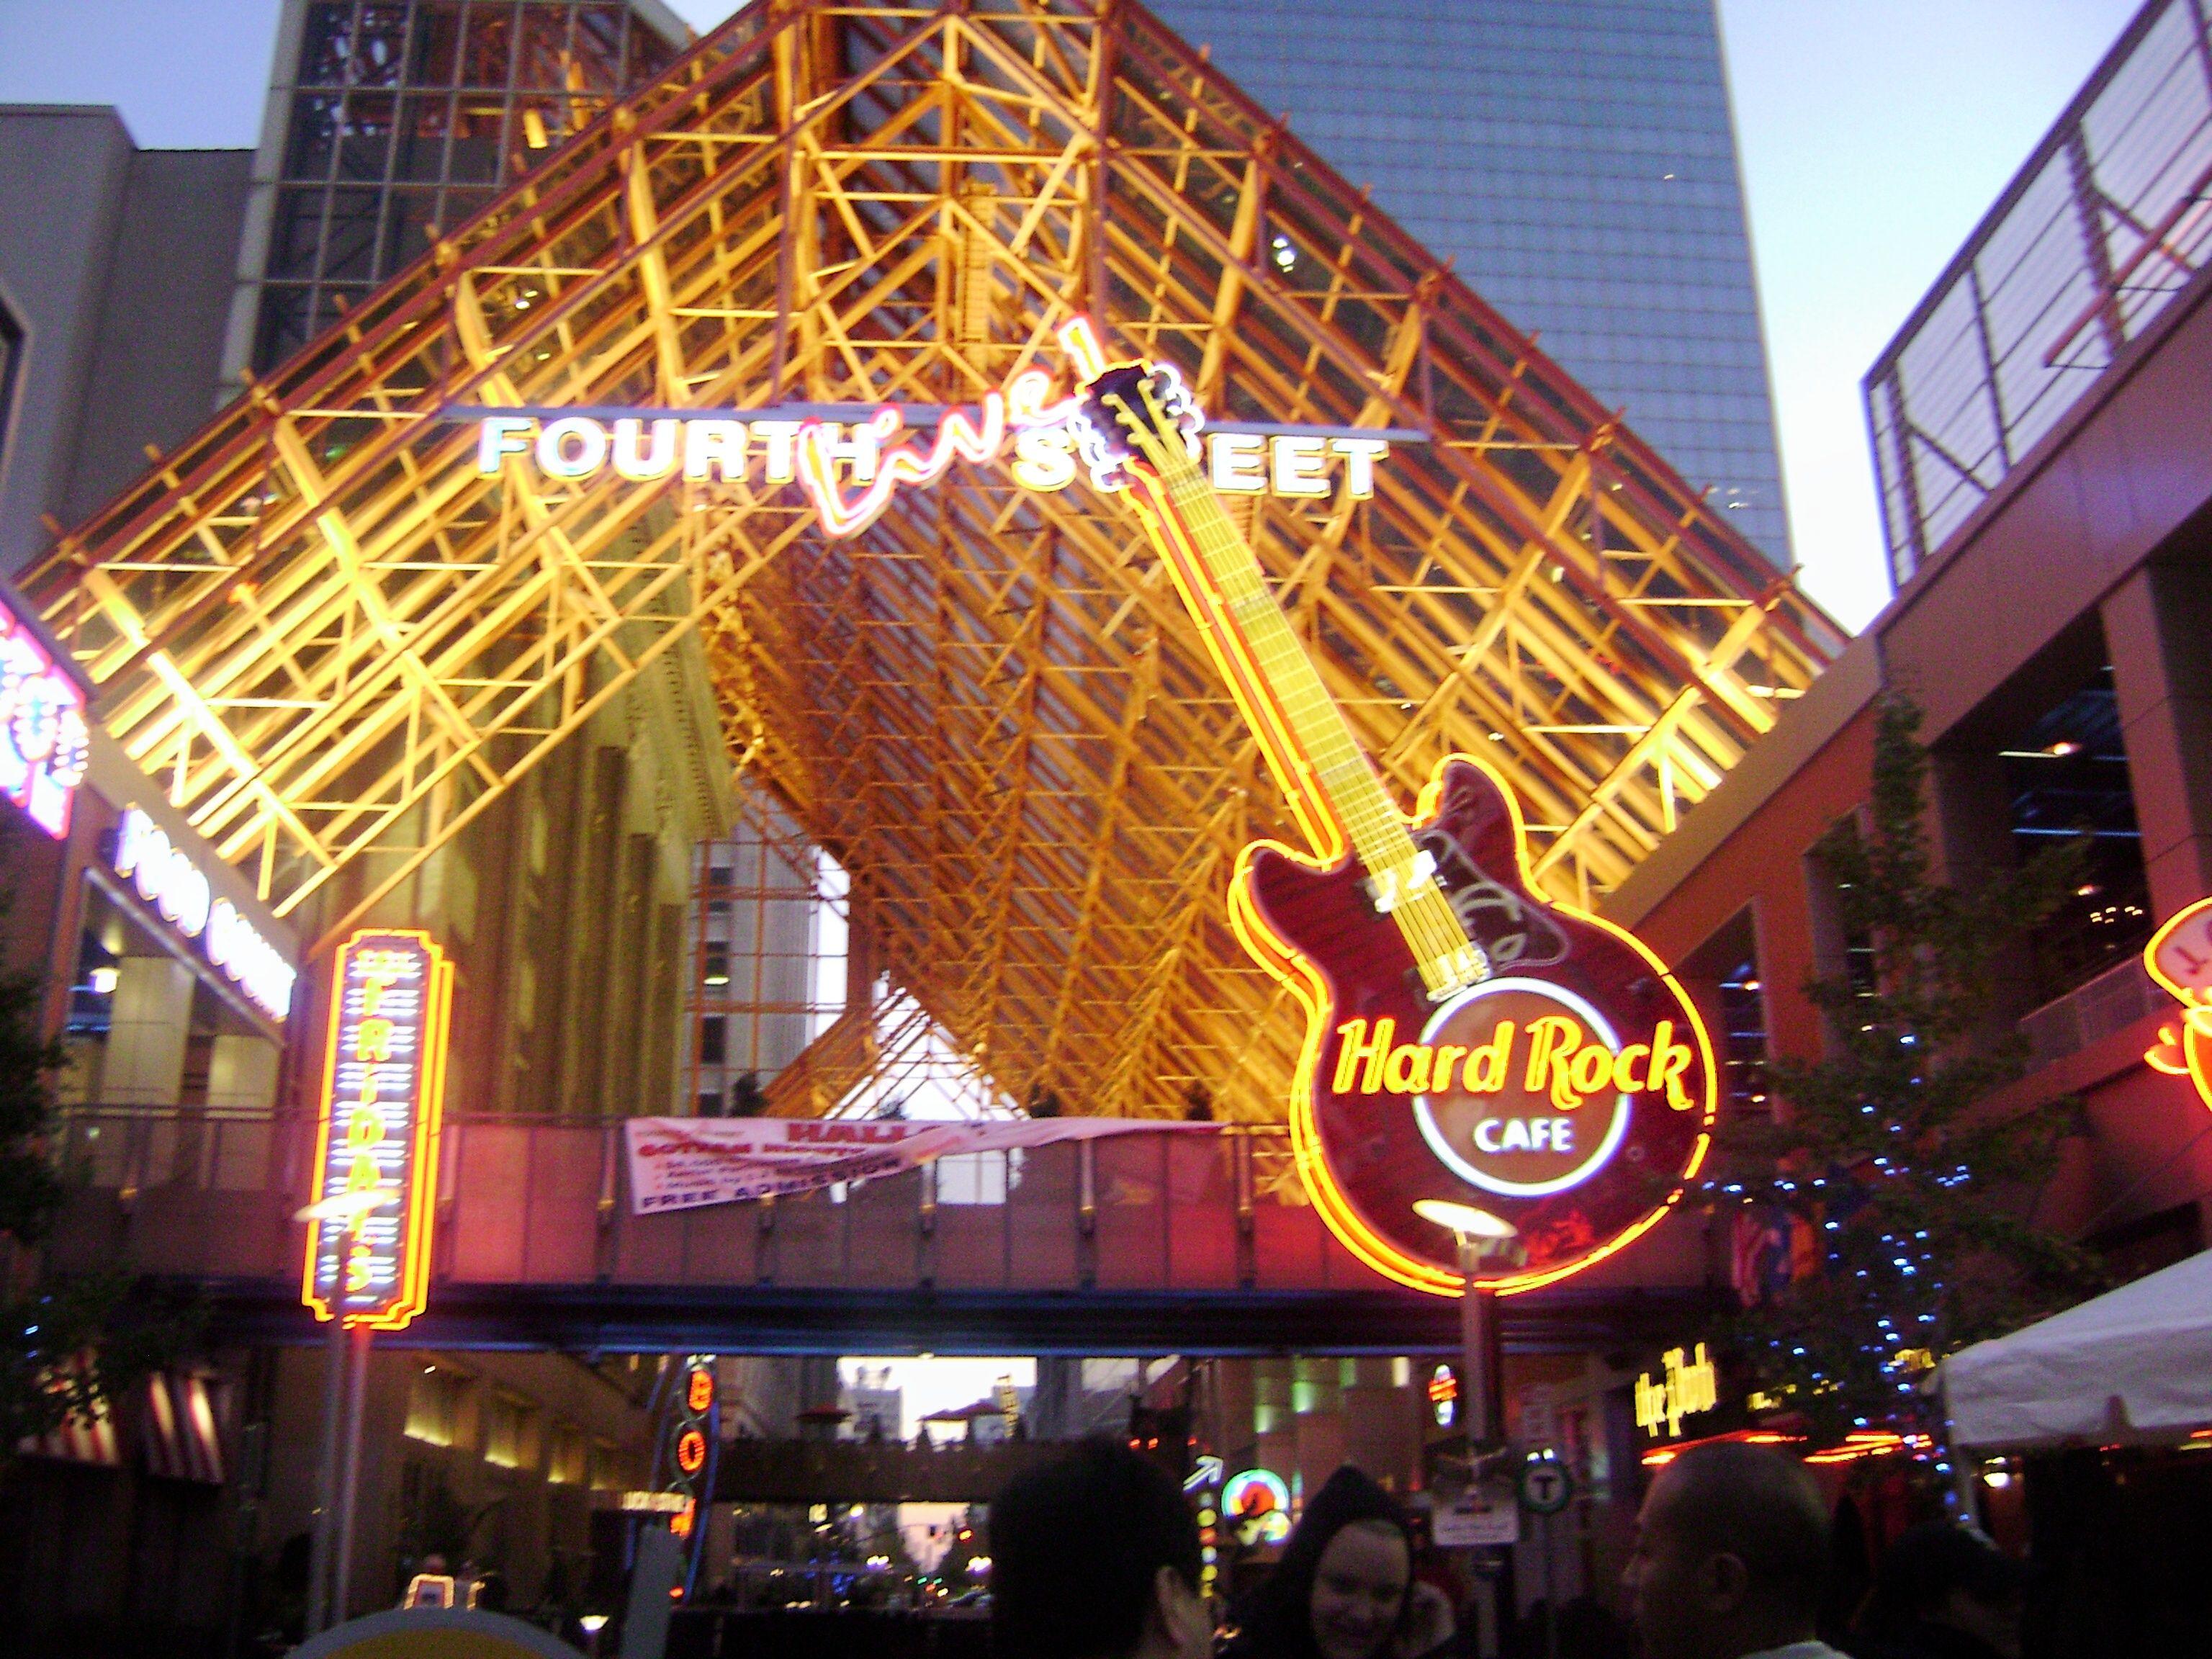 Hard Rock Cafe Louisville Ky